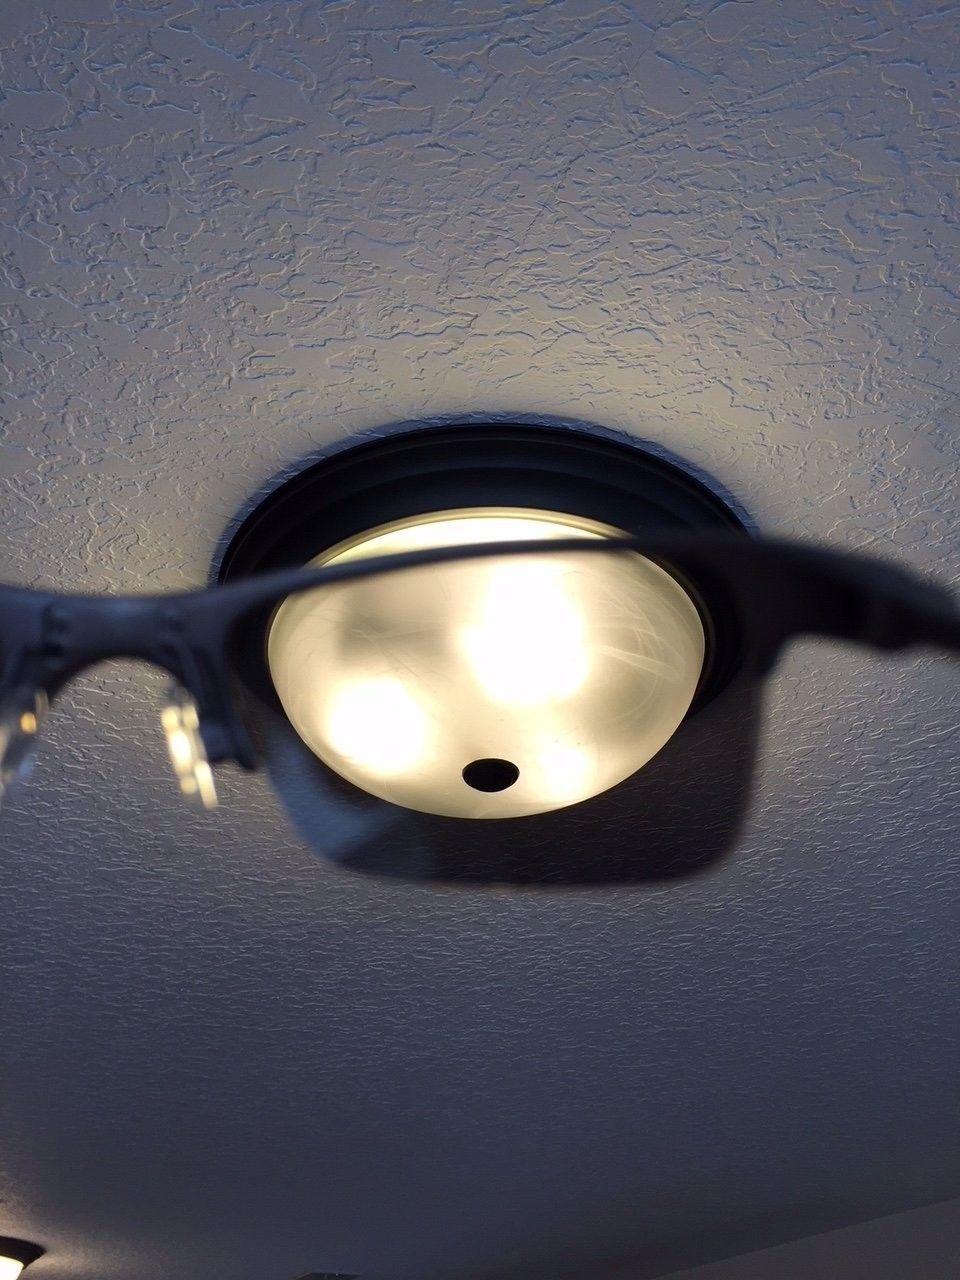 Oakley Razrwire Sunglasses. Pewter W/Black Iridium. - IMG_5876.JPG